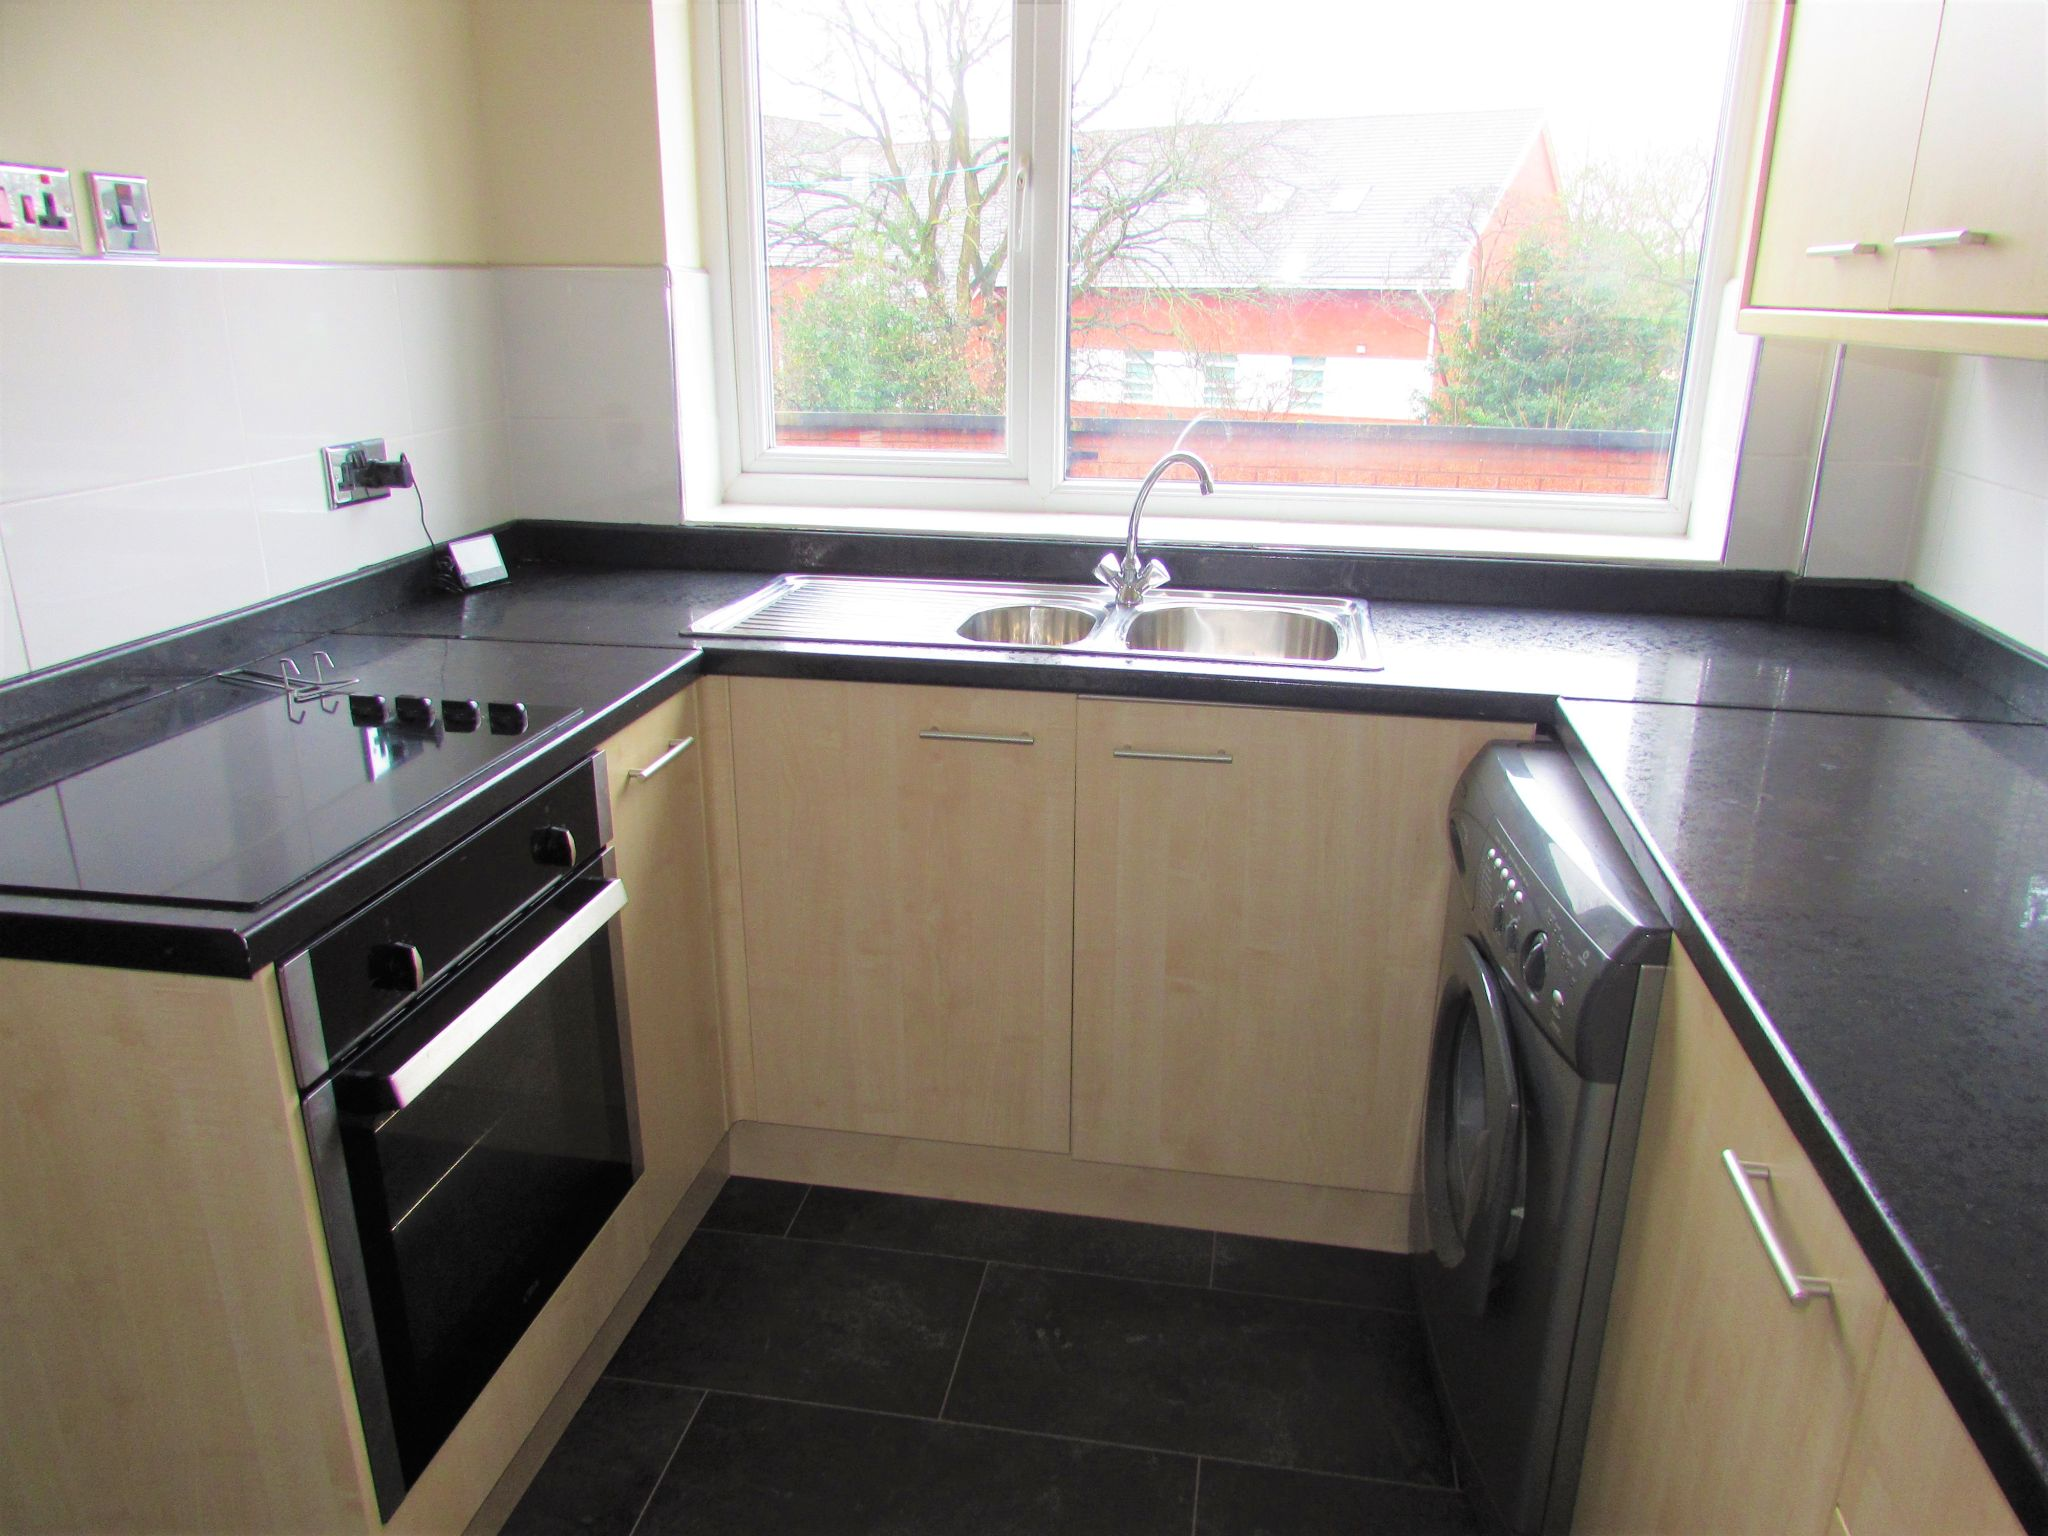 2 Bedroom Duplex Flat/apartment To Rent - Kitchen